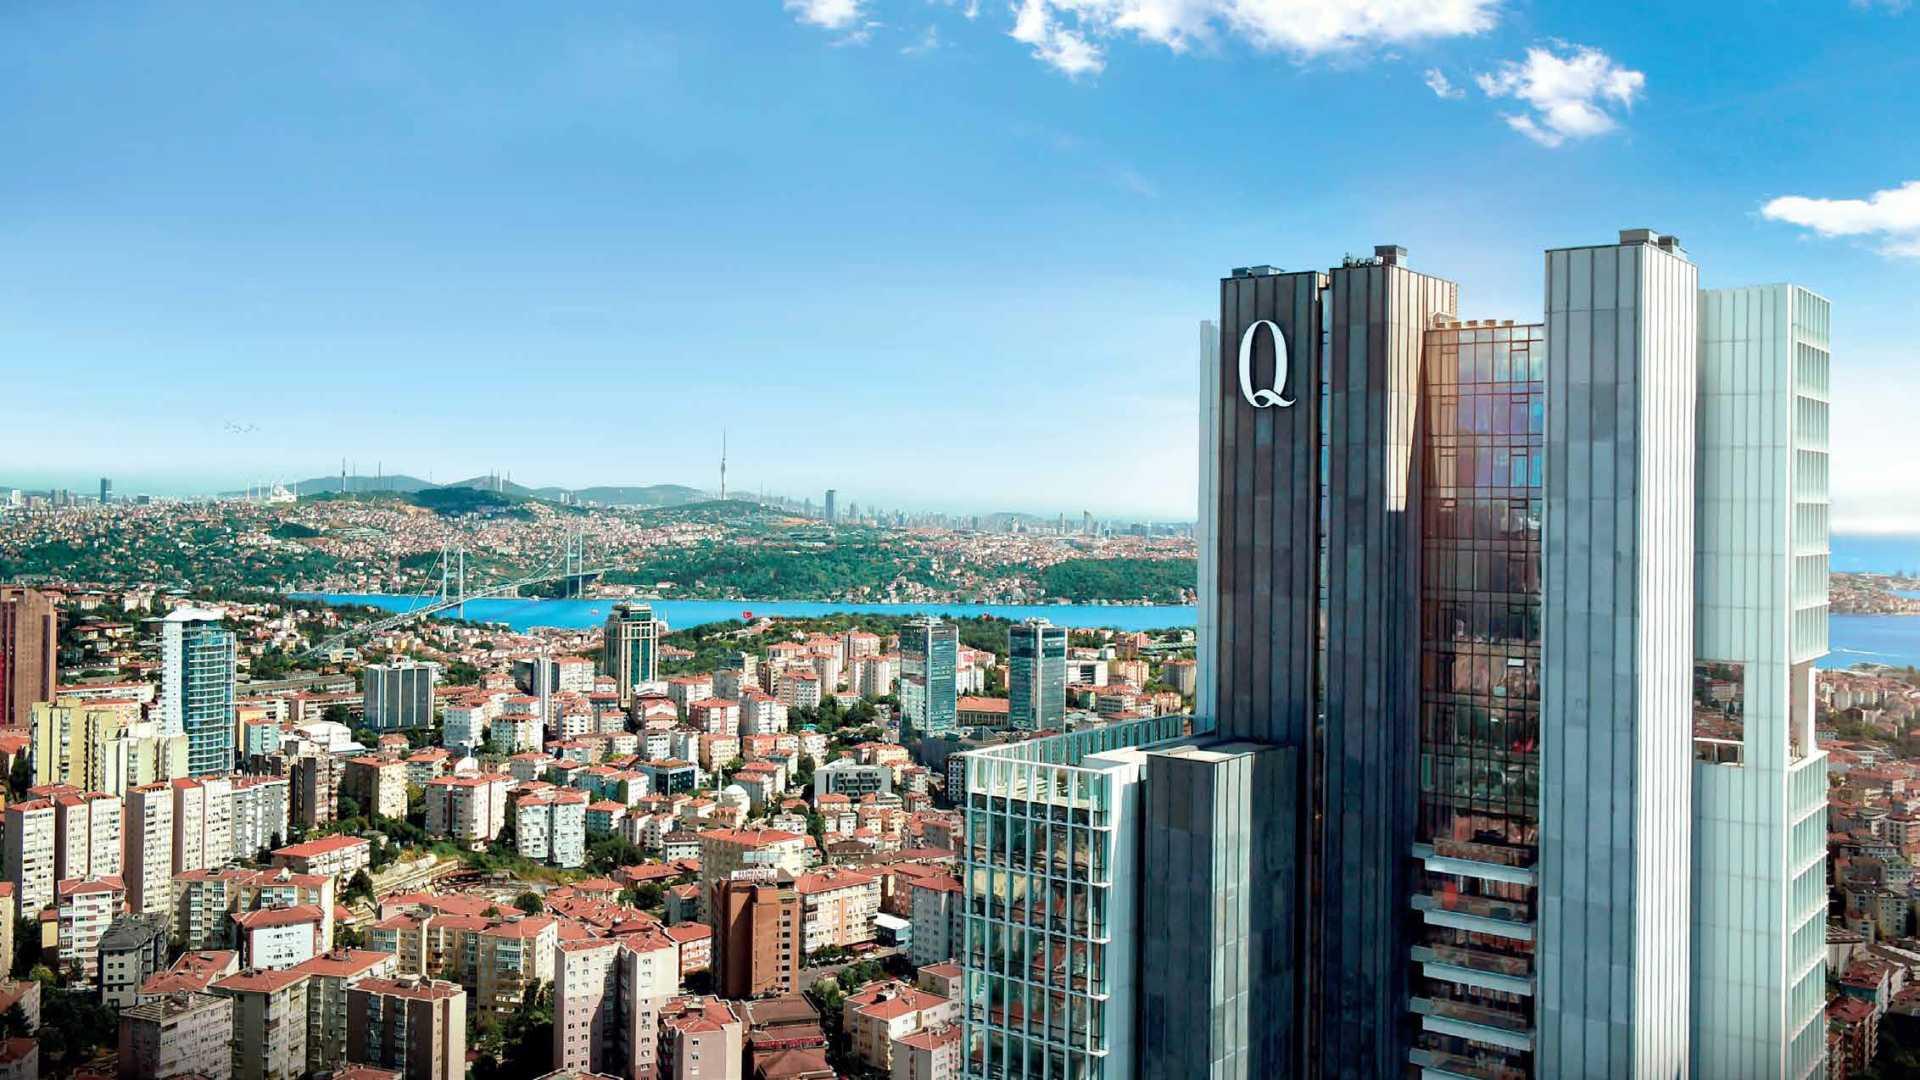 CATALOG 4 املاک ترکیه پروژه شماره 11